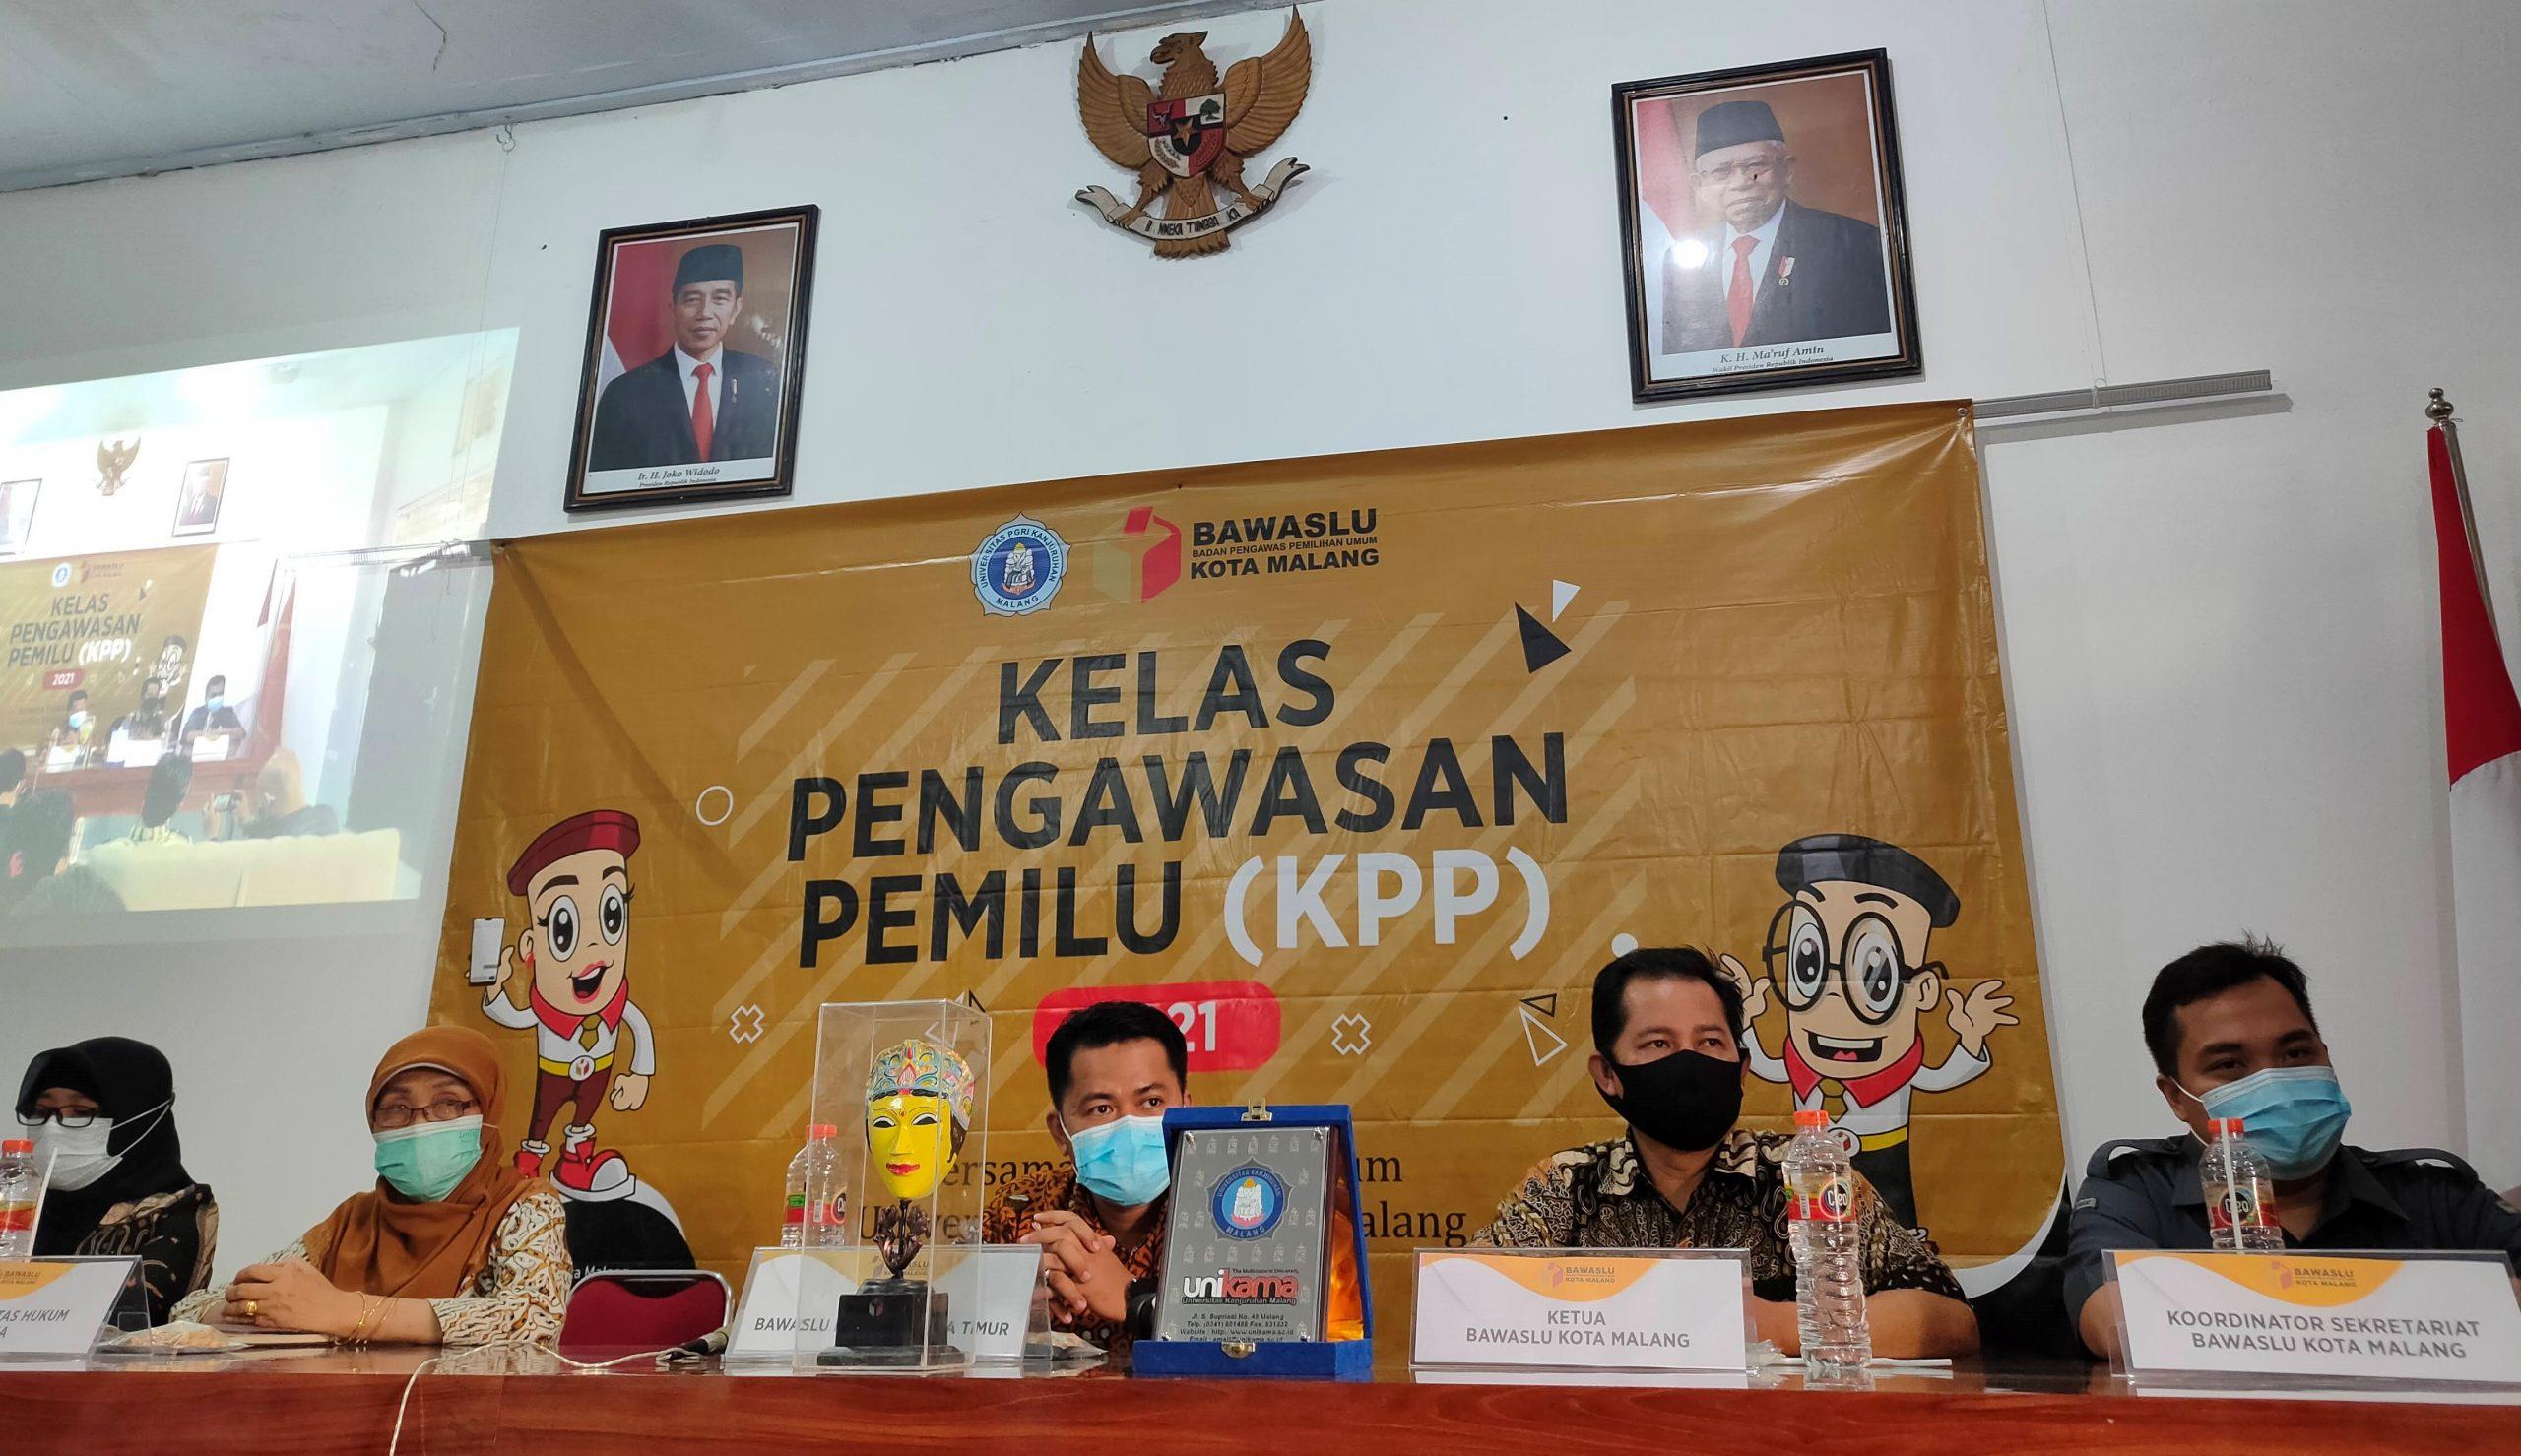 Implementasikan Kampus Merdeka Belajar Fakultas Hukum Unikama Buka Kelas Pengawasan Pemilu (KPP) Pertama Di  Jawa Timur Berkerjasama dengan Bawaslu Kota Malang